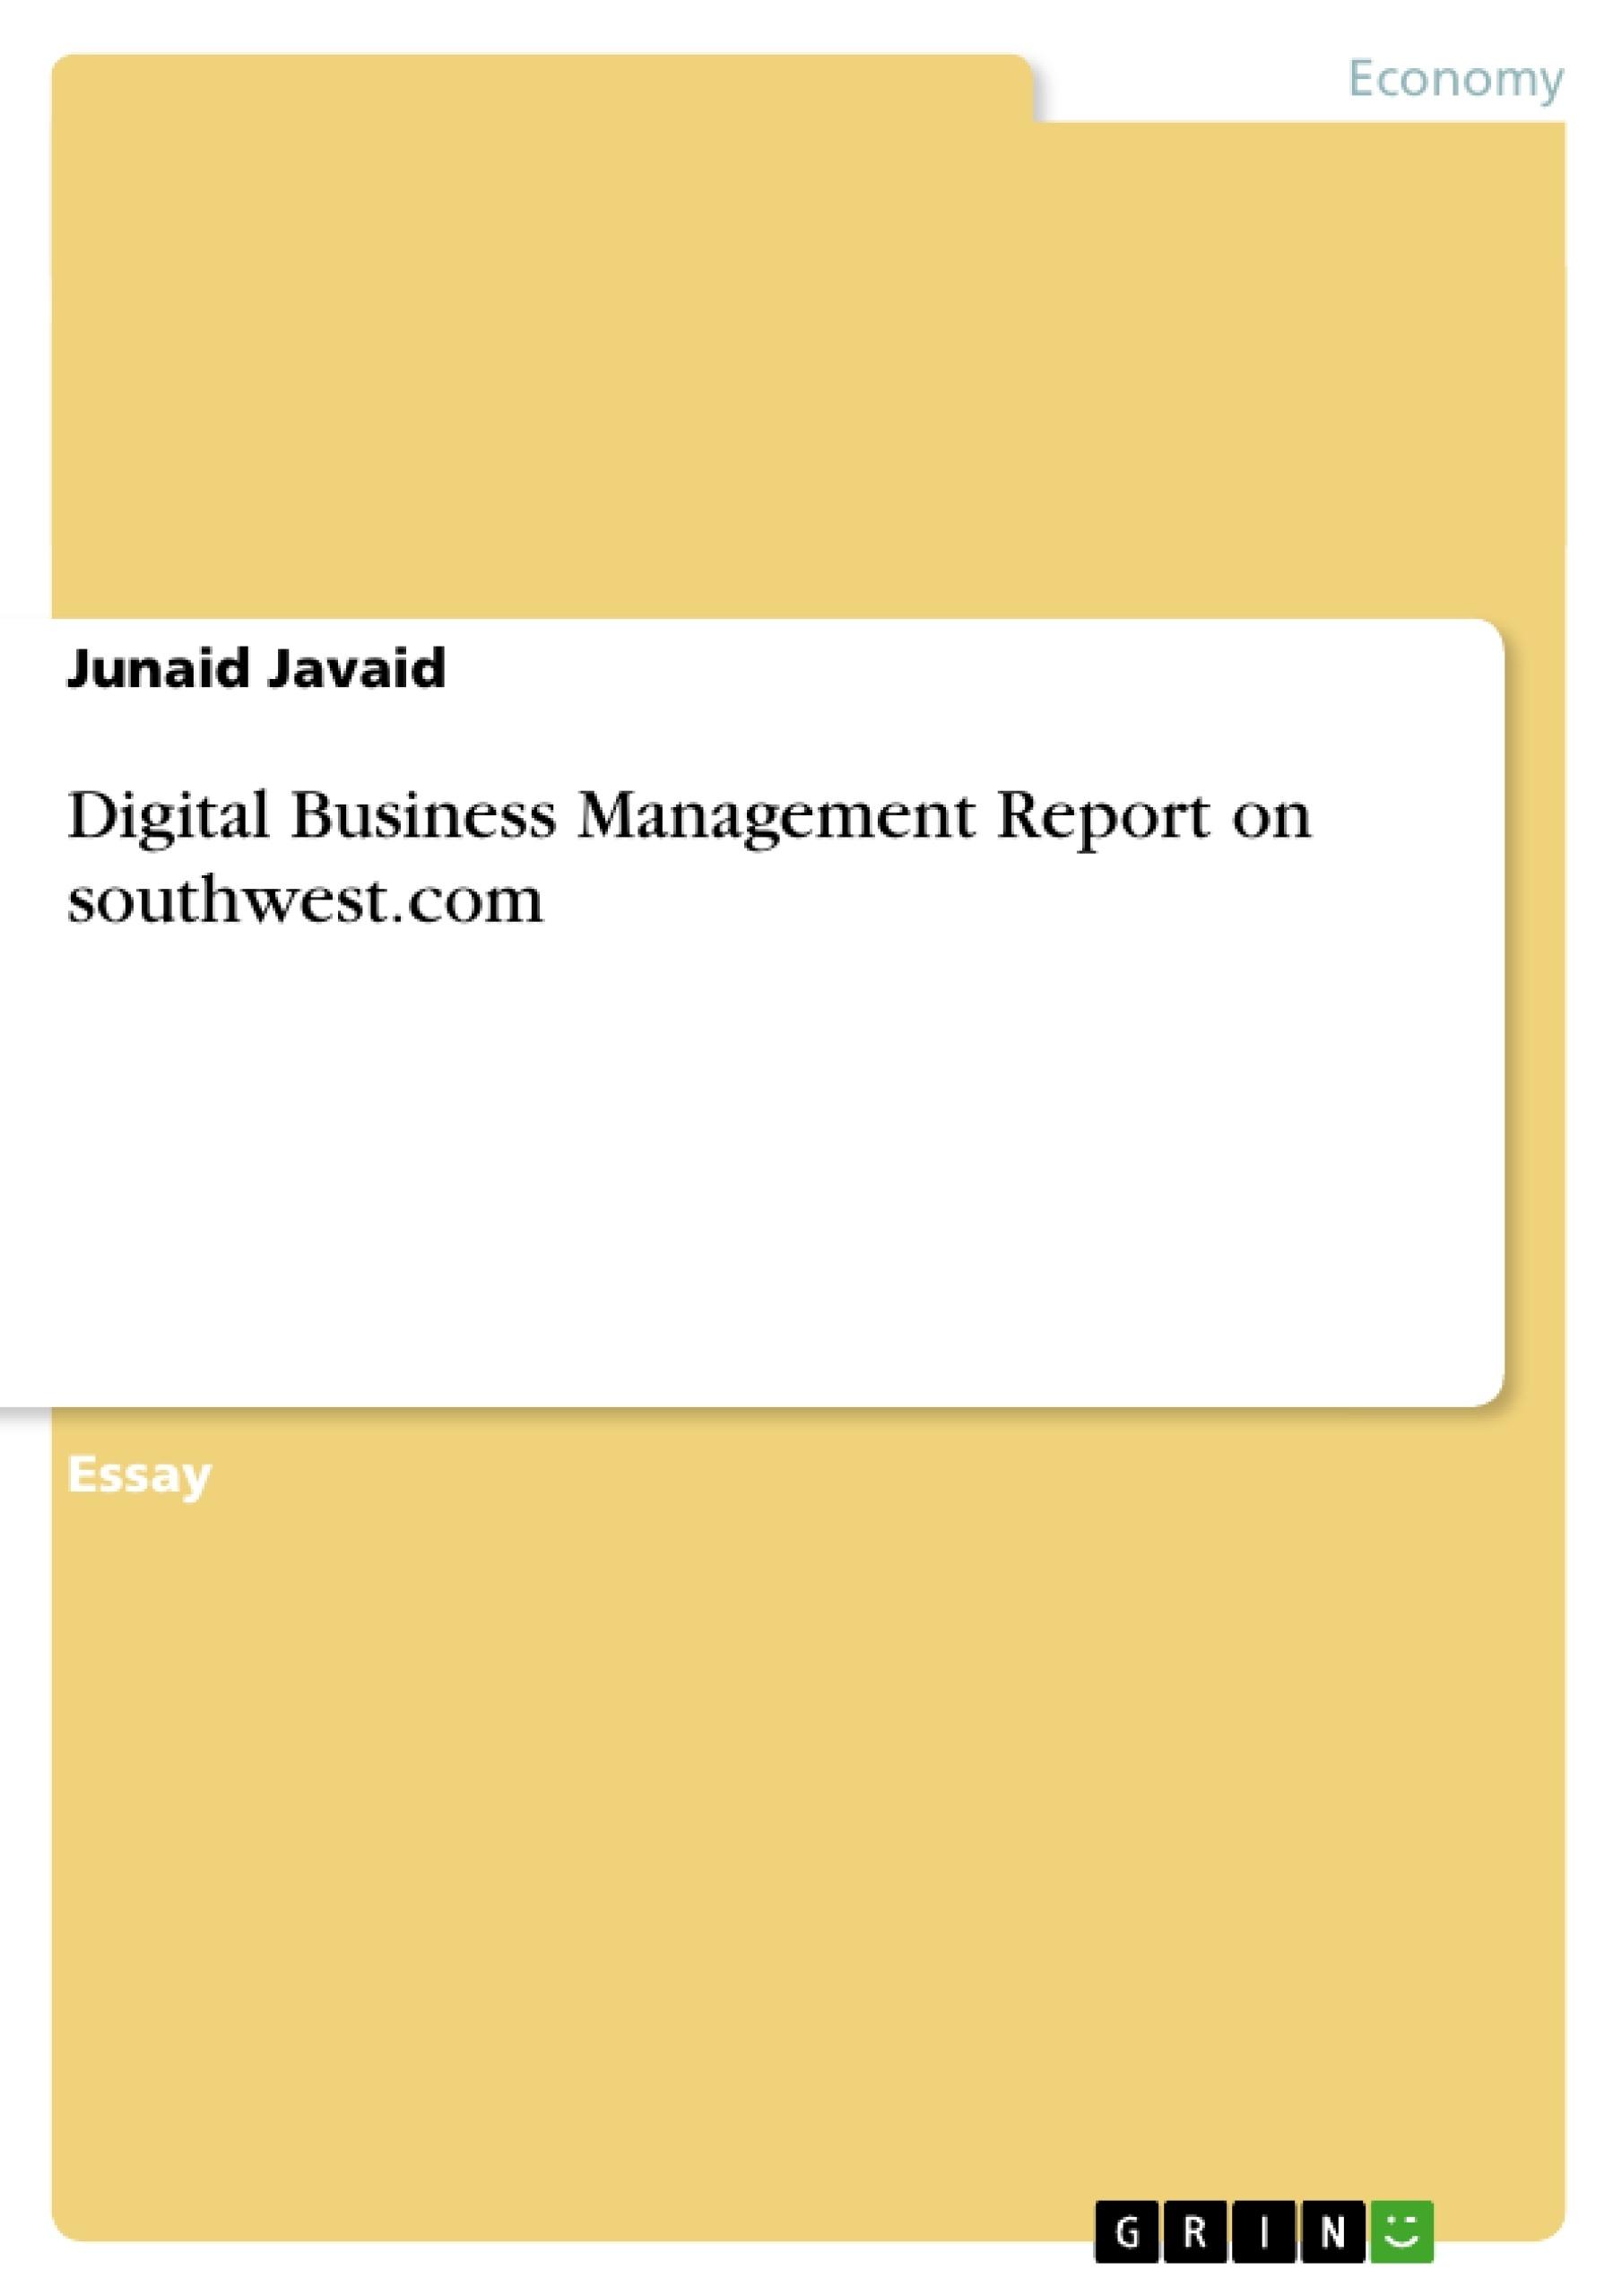 Title: Digital Business Management Report on southwest.com